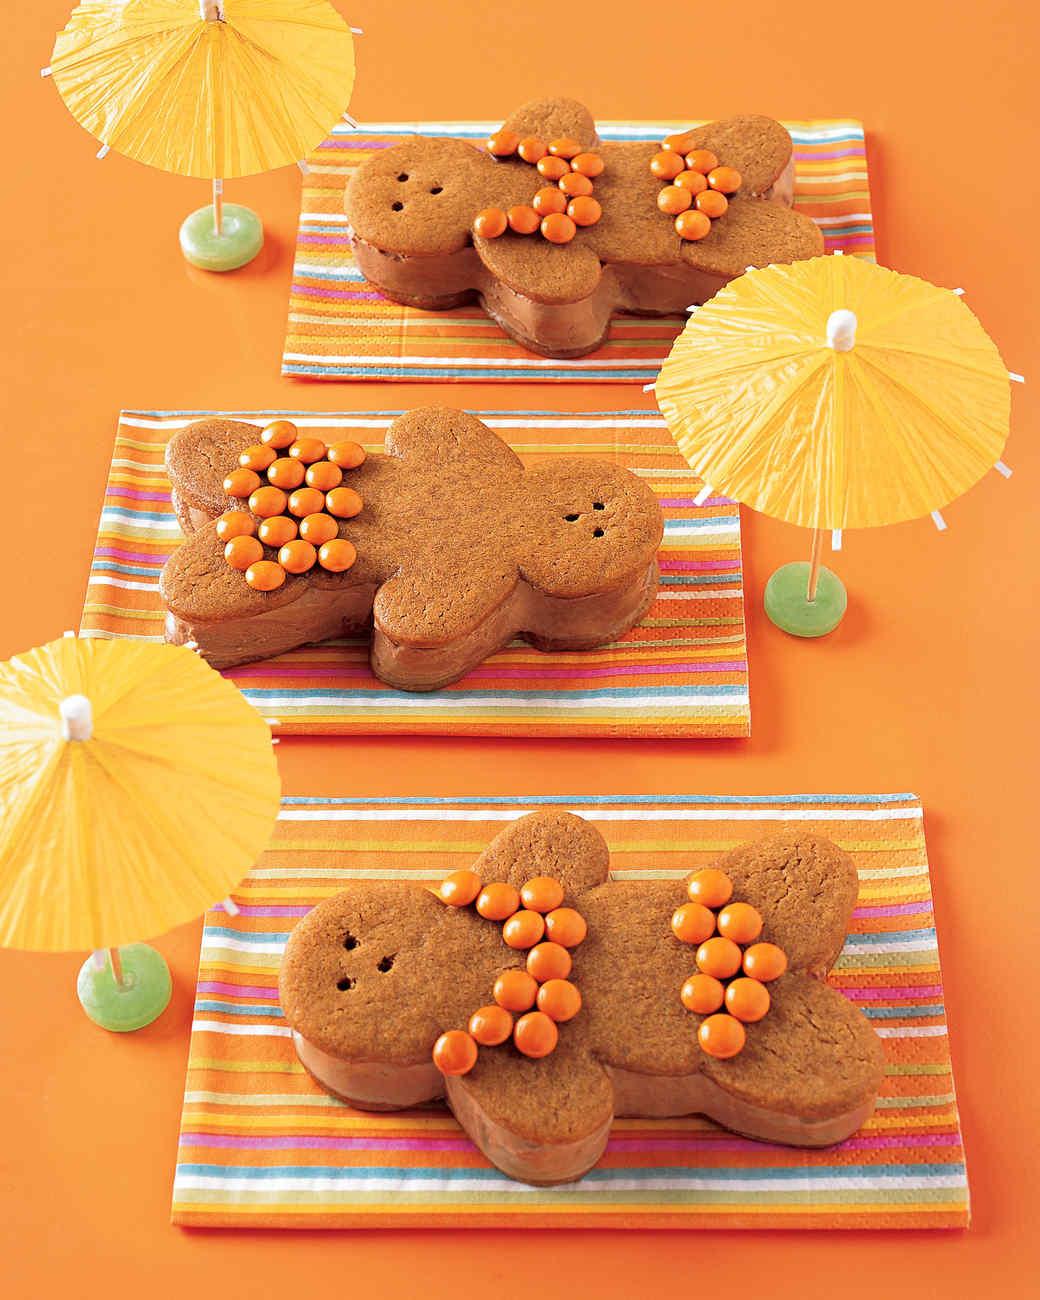 chocolate-ginger-bathing-beauties-a1014121.jpg